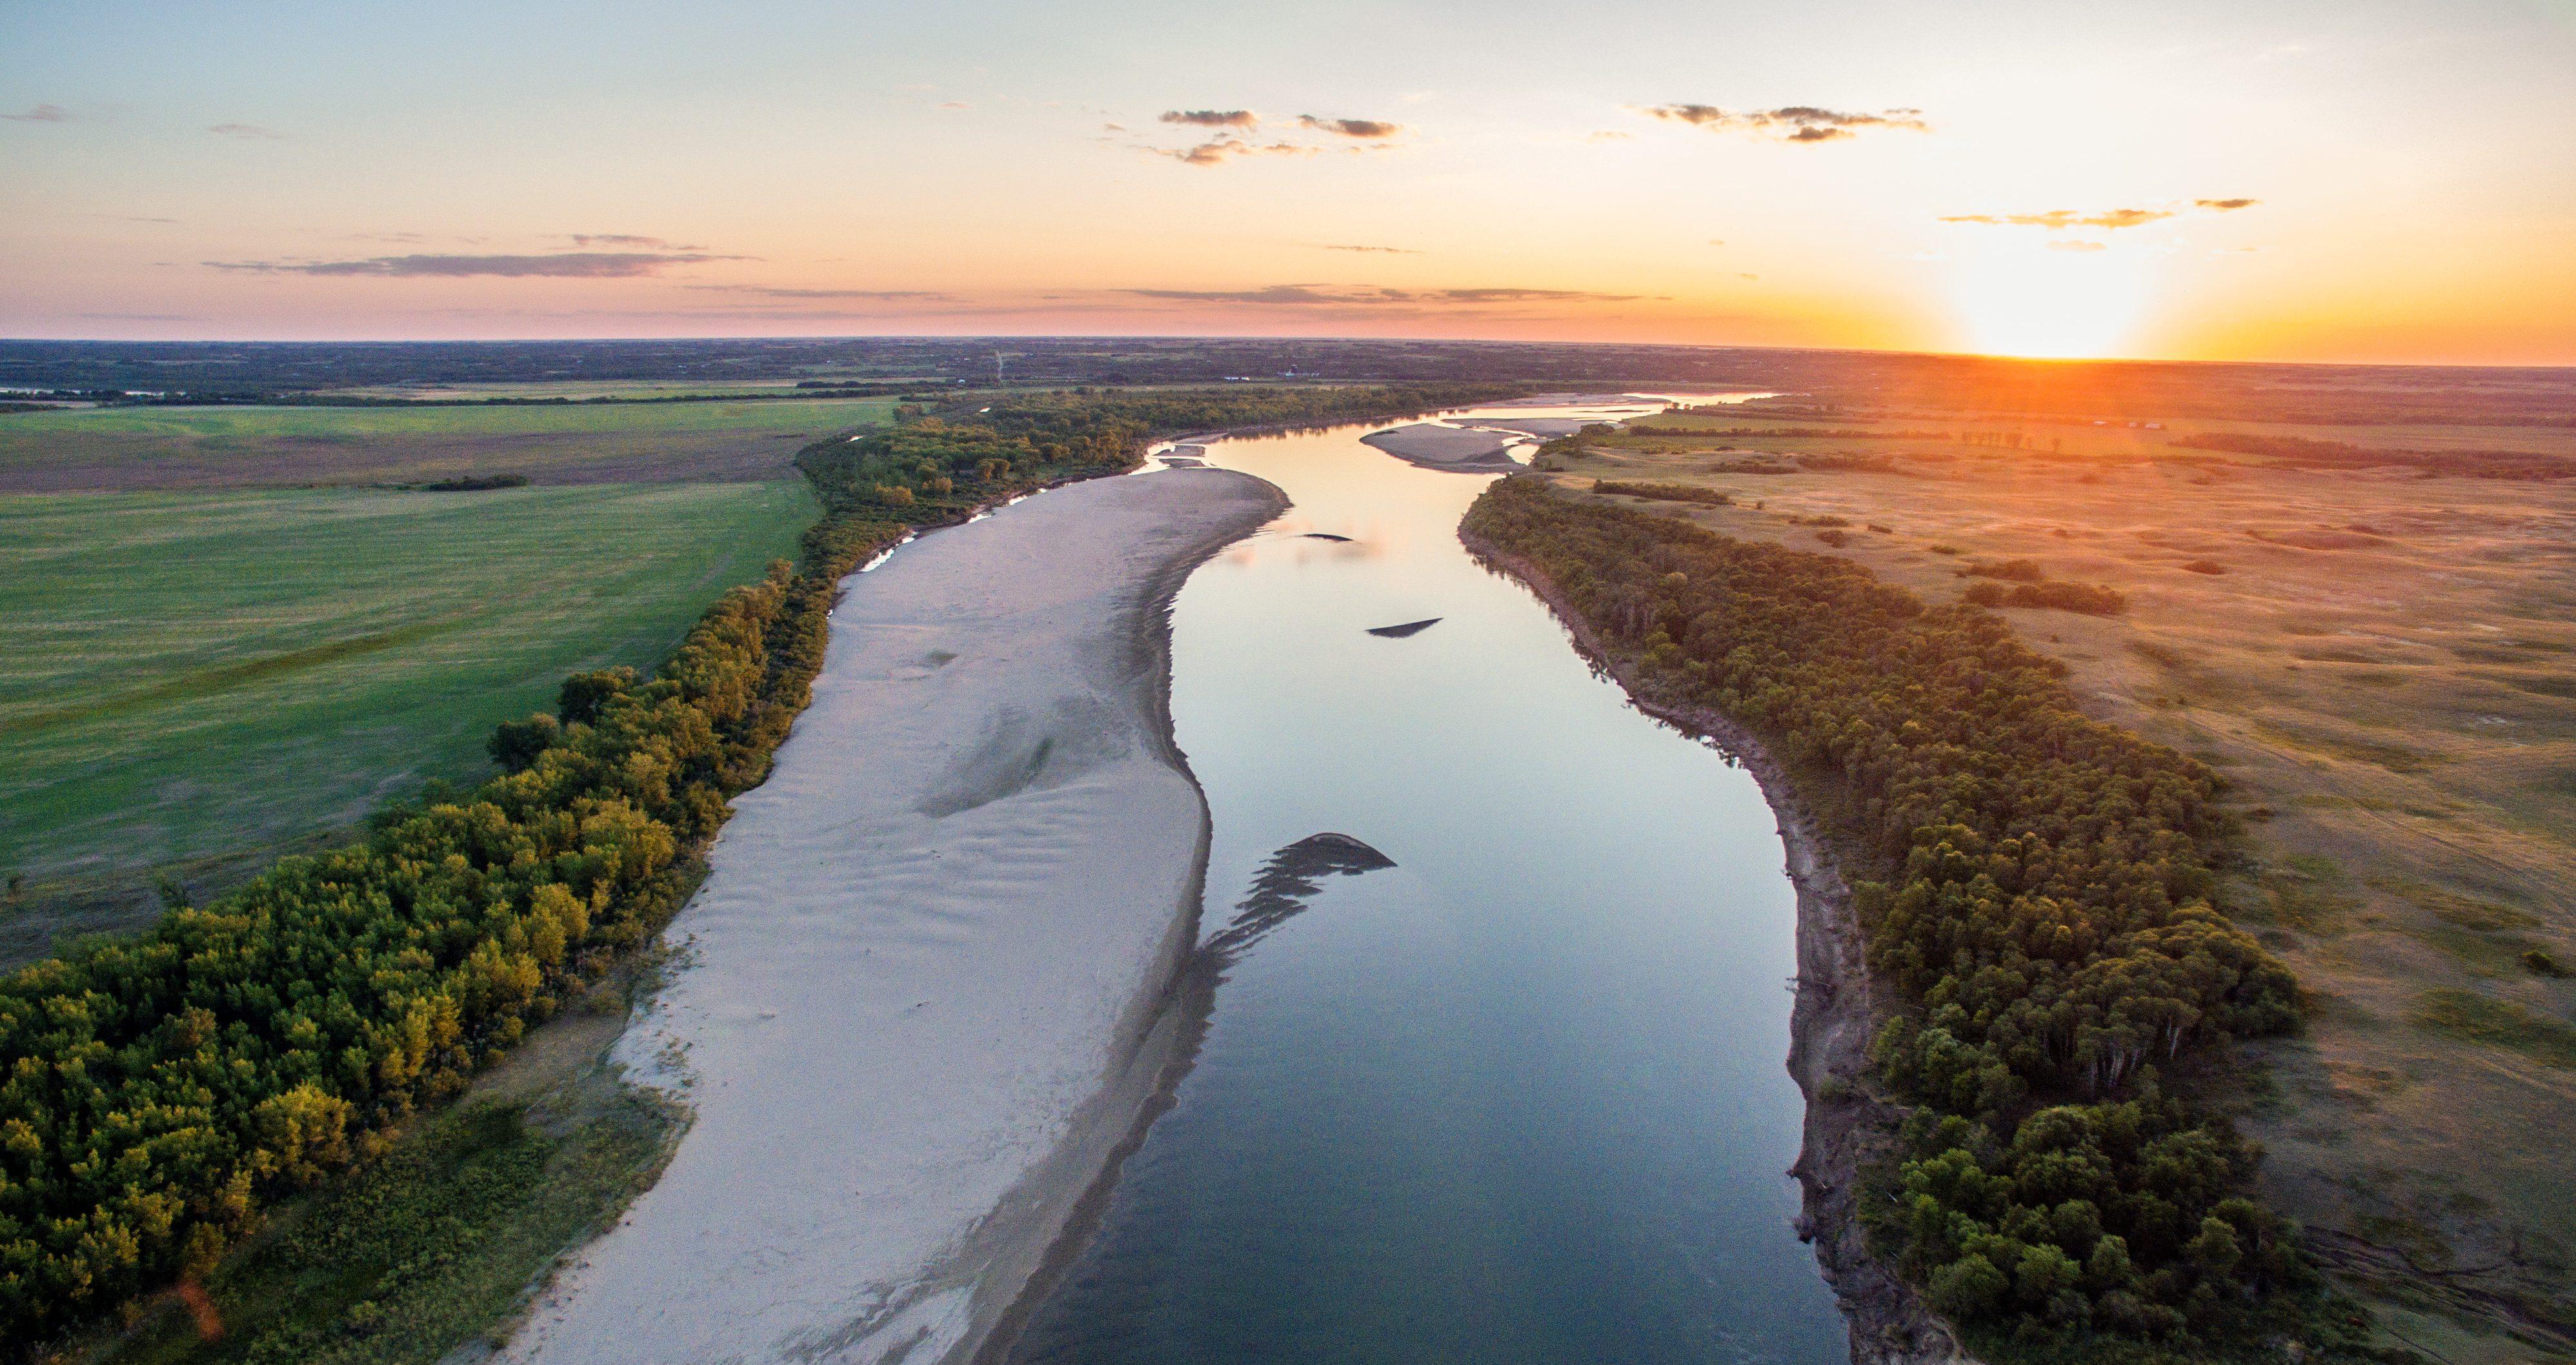 Whitecap Saskatchewan